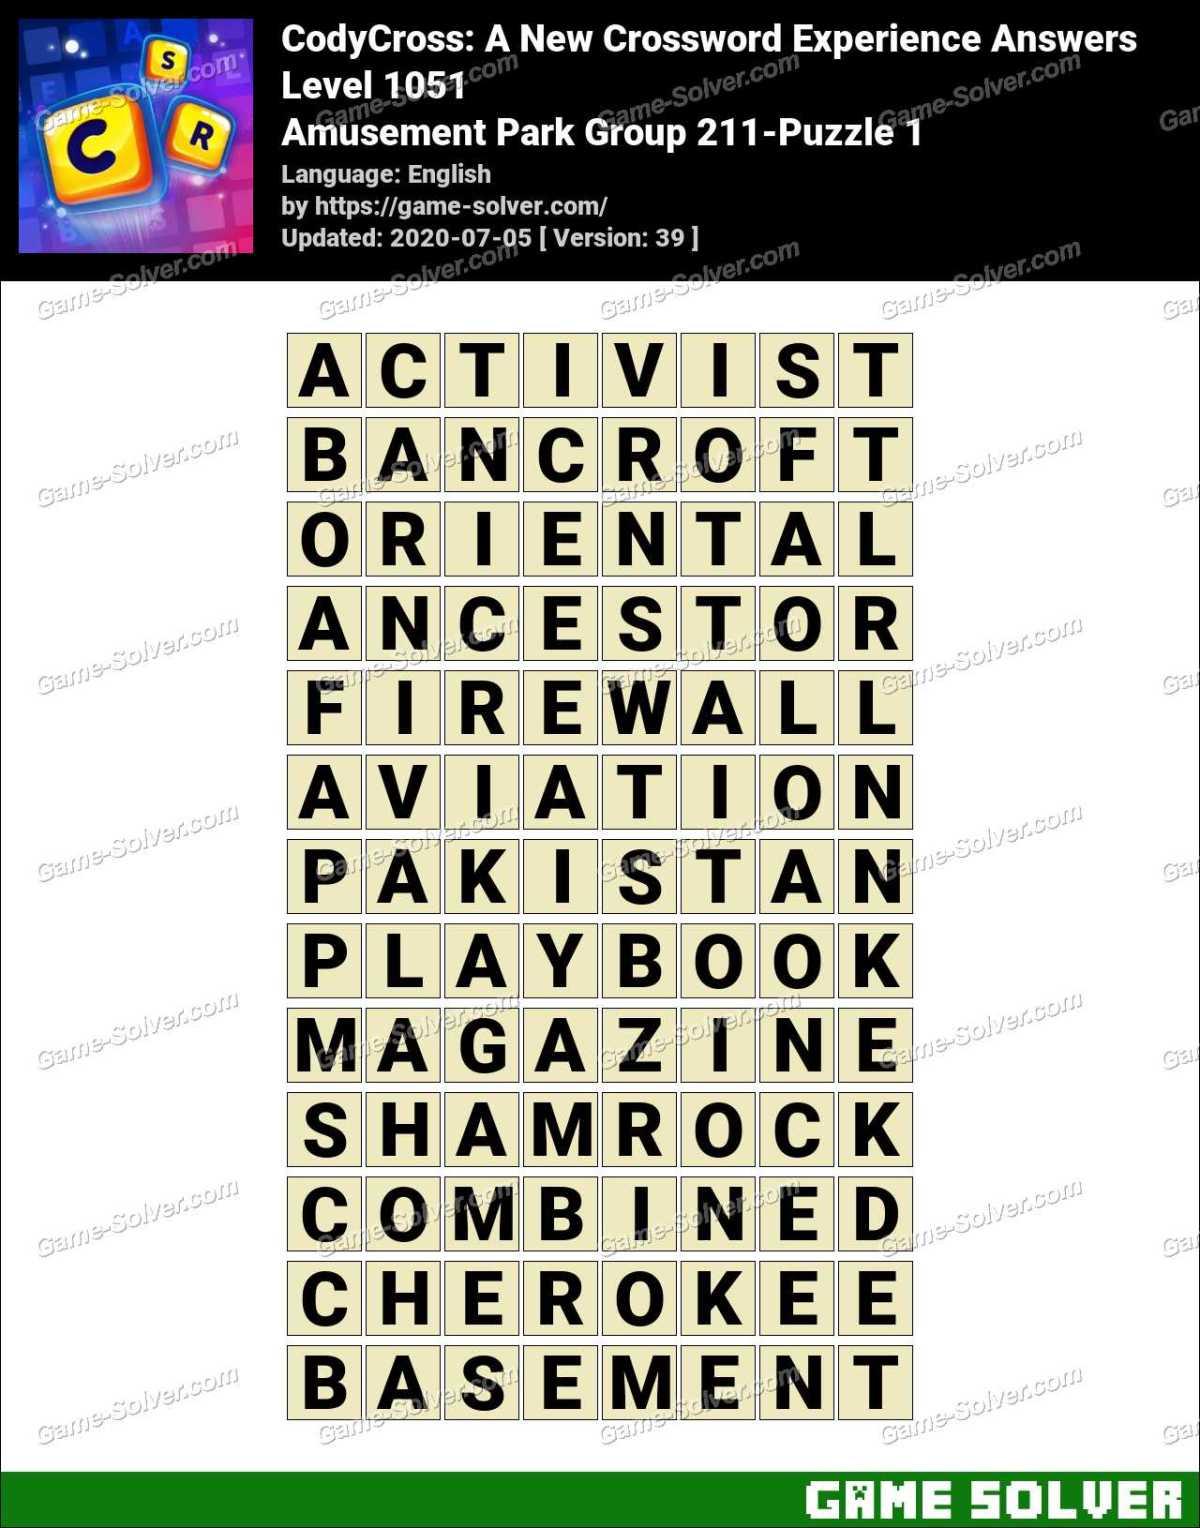 CodyCross Amusement Park Group 211-Puzzle 1 Answers